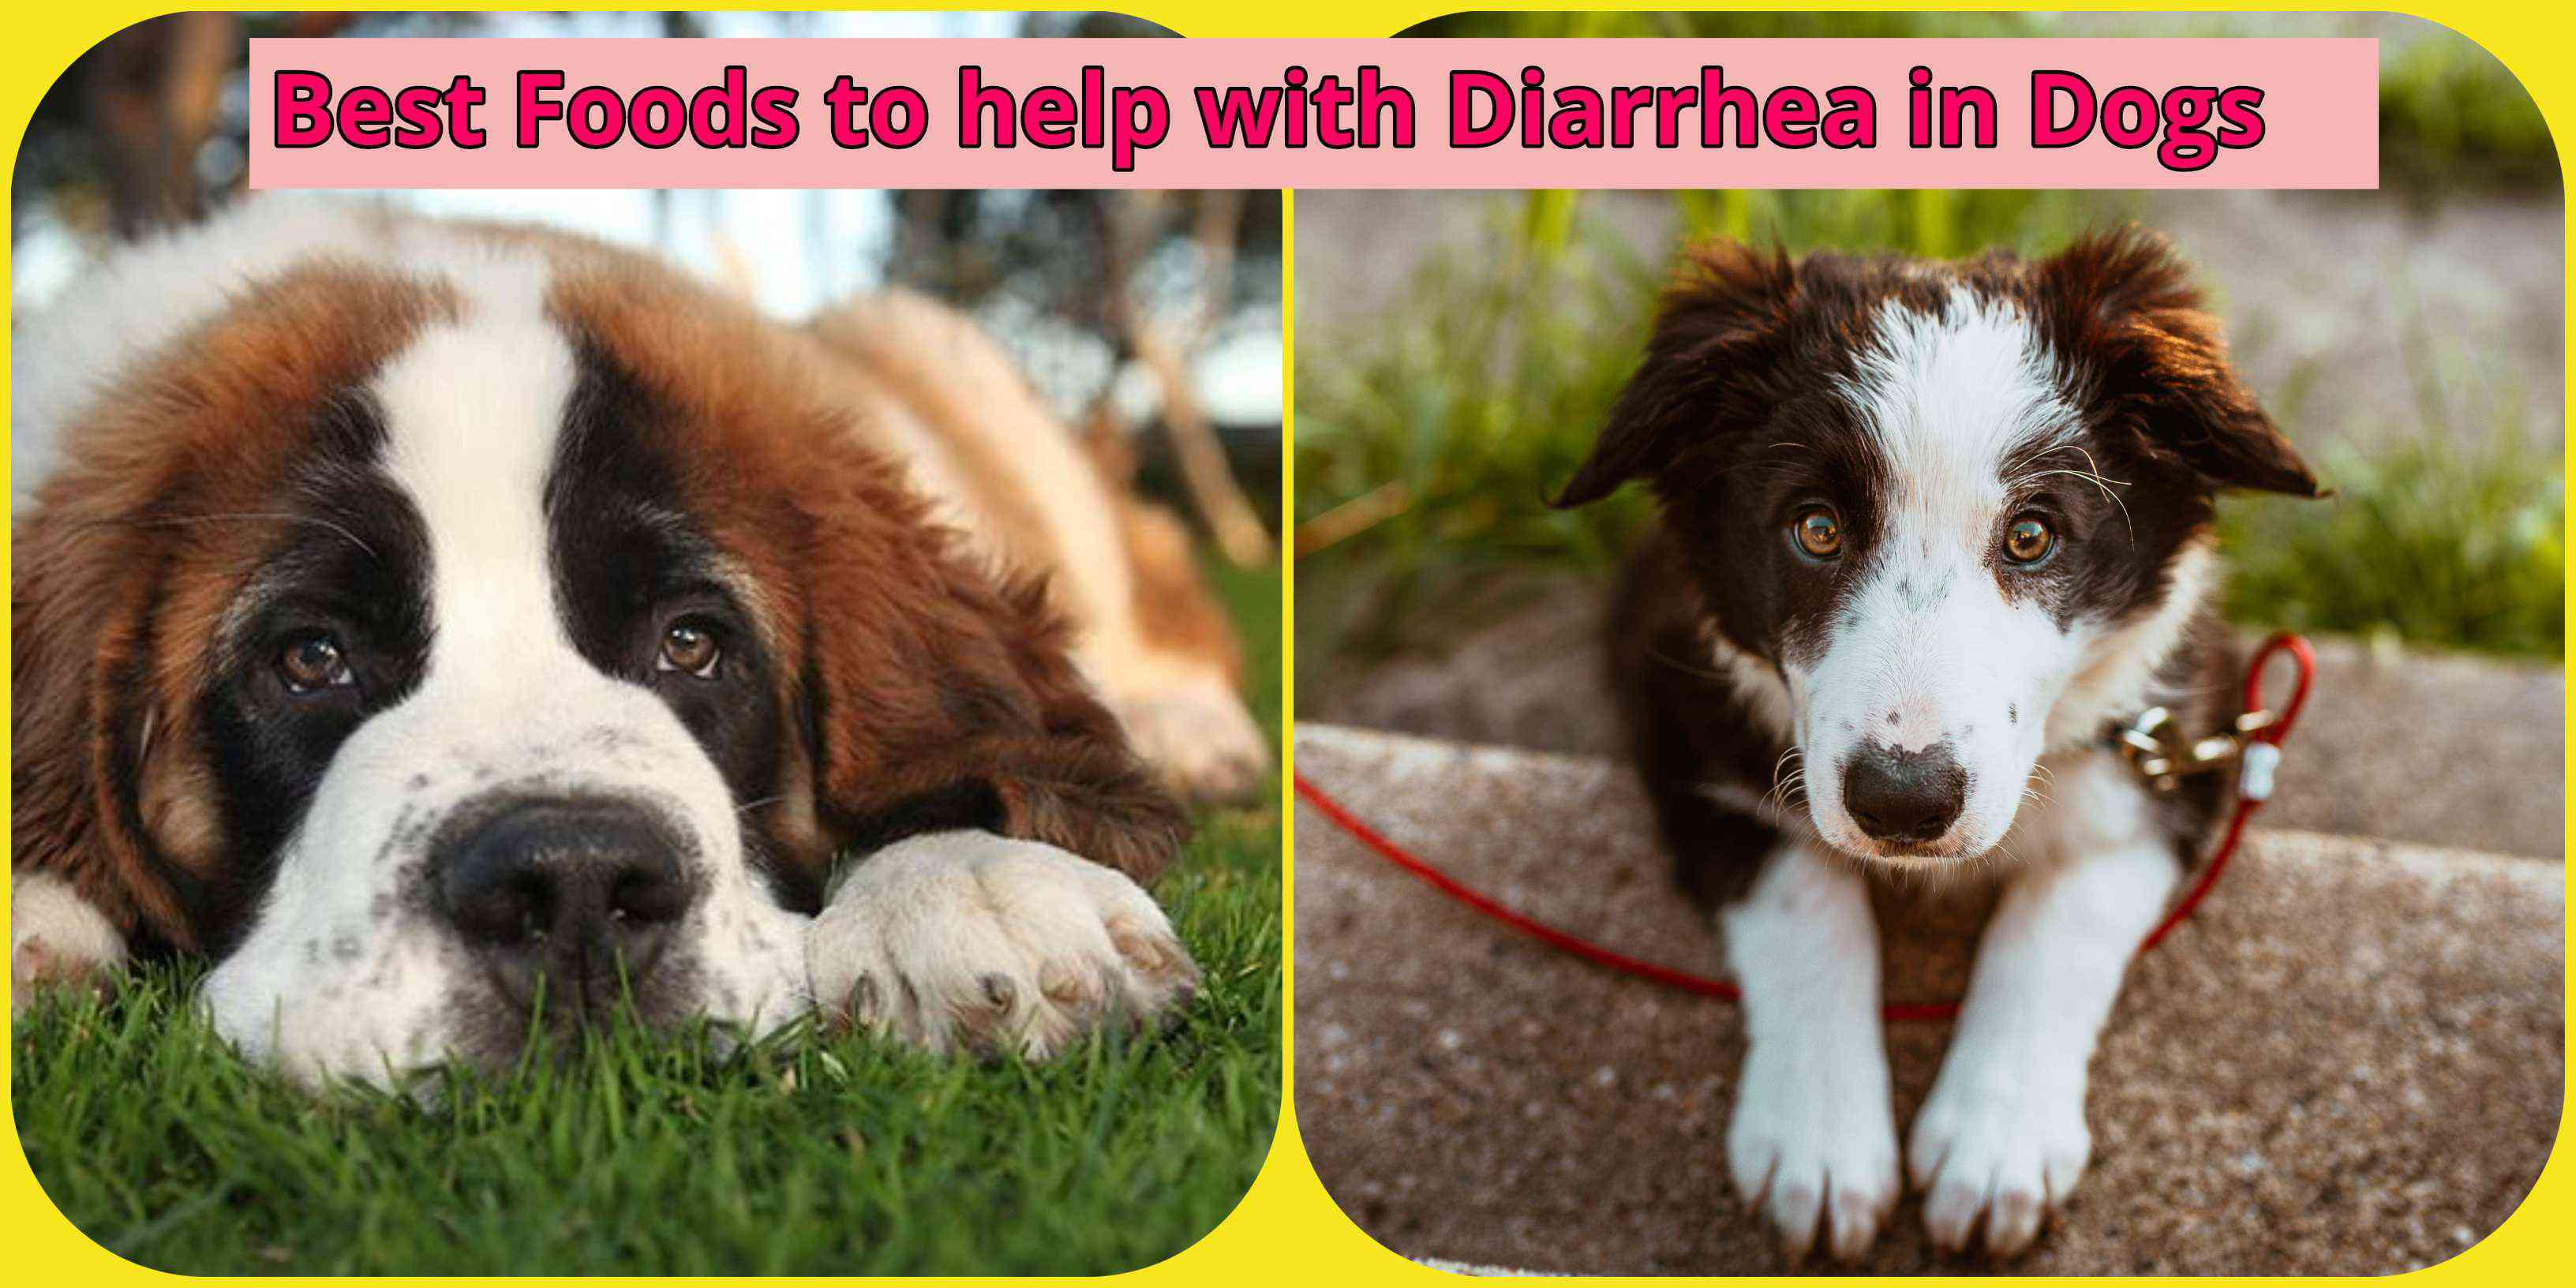 two sad dogs with diarrhea